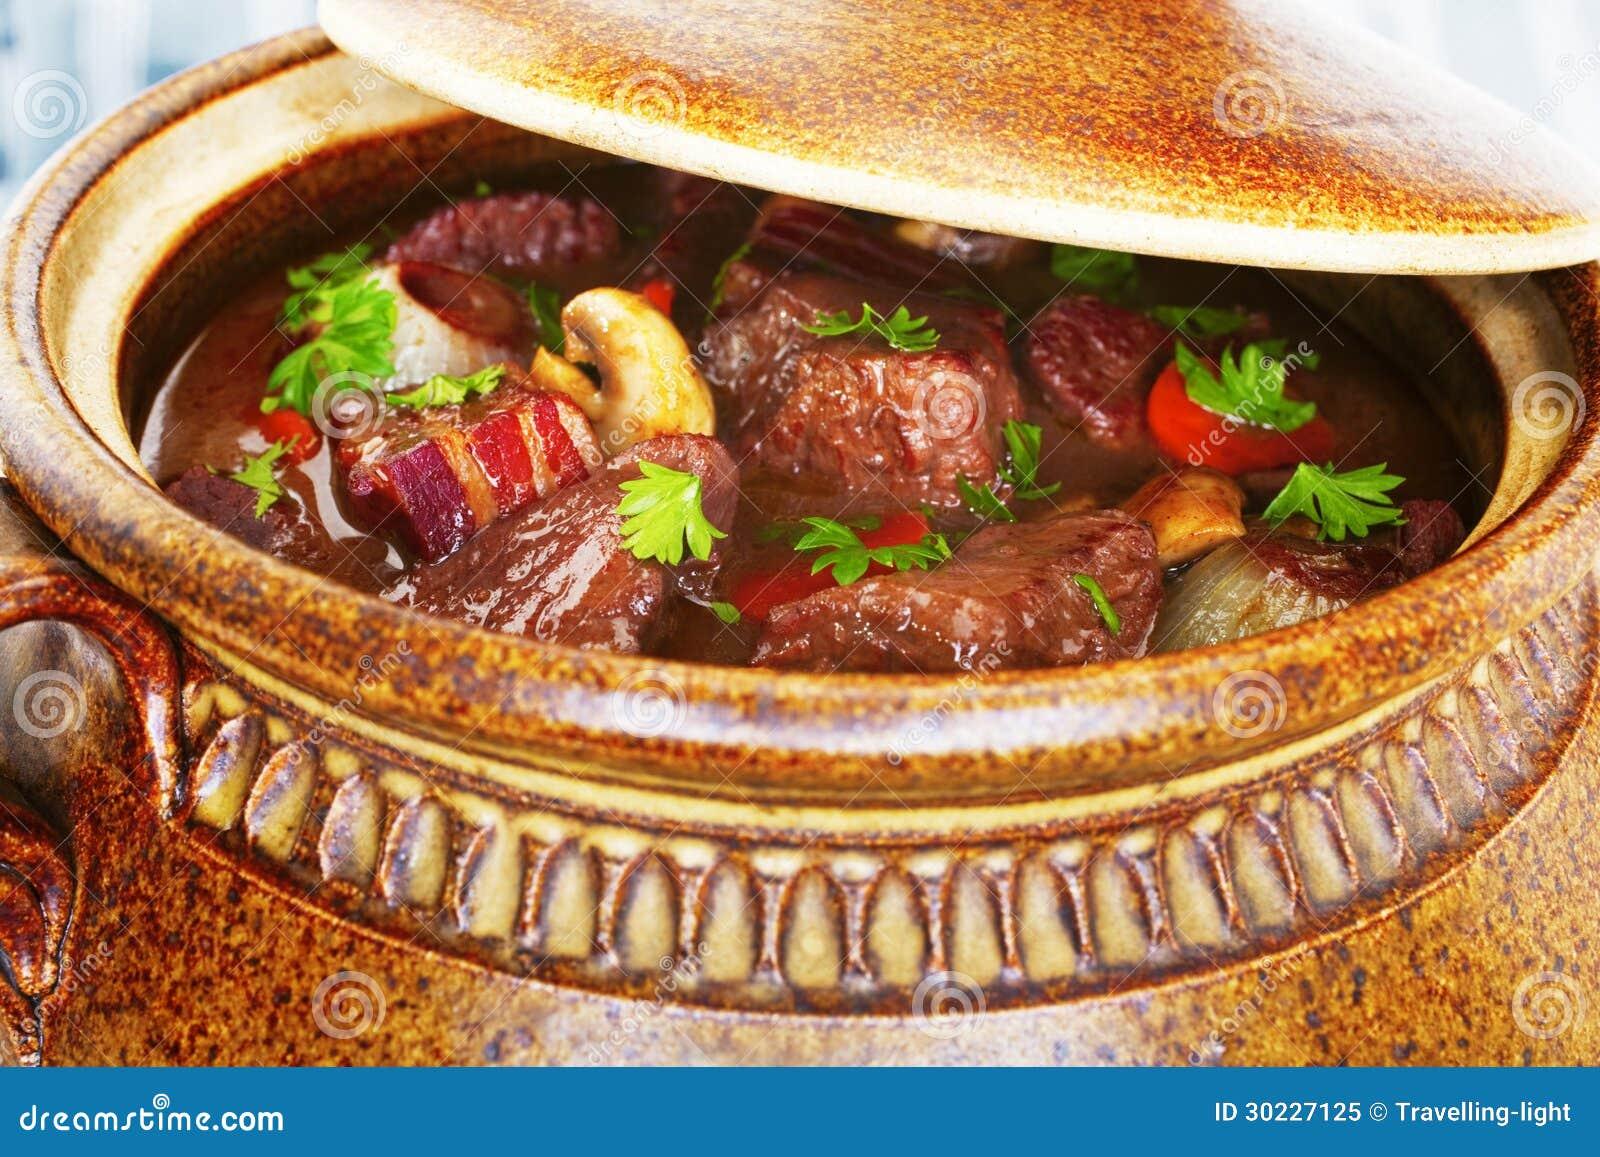 牛肉Bourguignnon炖煮的食物砂锅